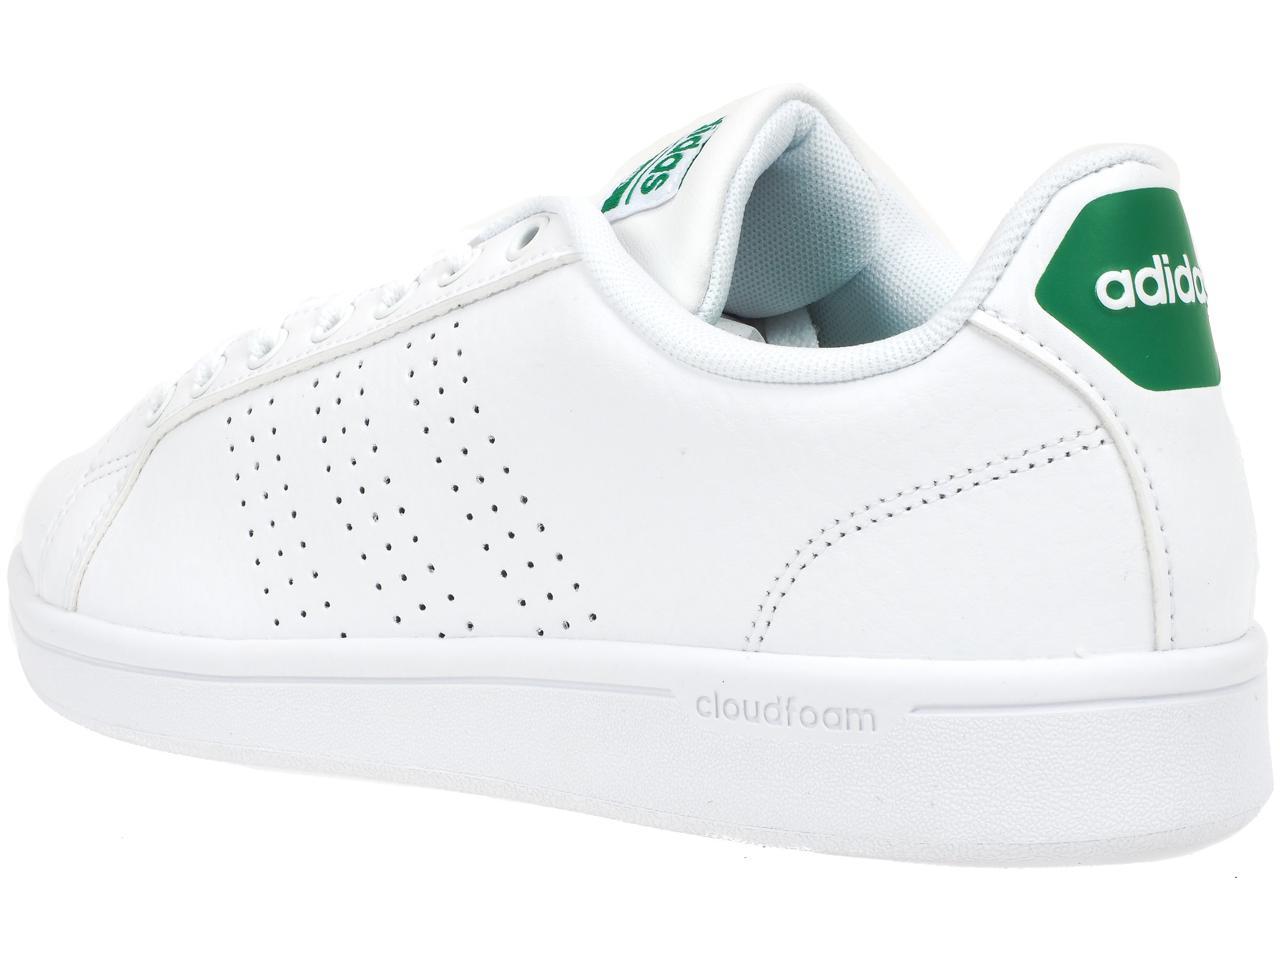 Chaussures-mode-ville-Adidas-neo-Advantage-2-blc-vrt-Blanc-38890-Neuf